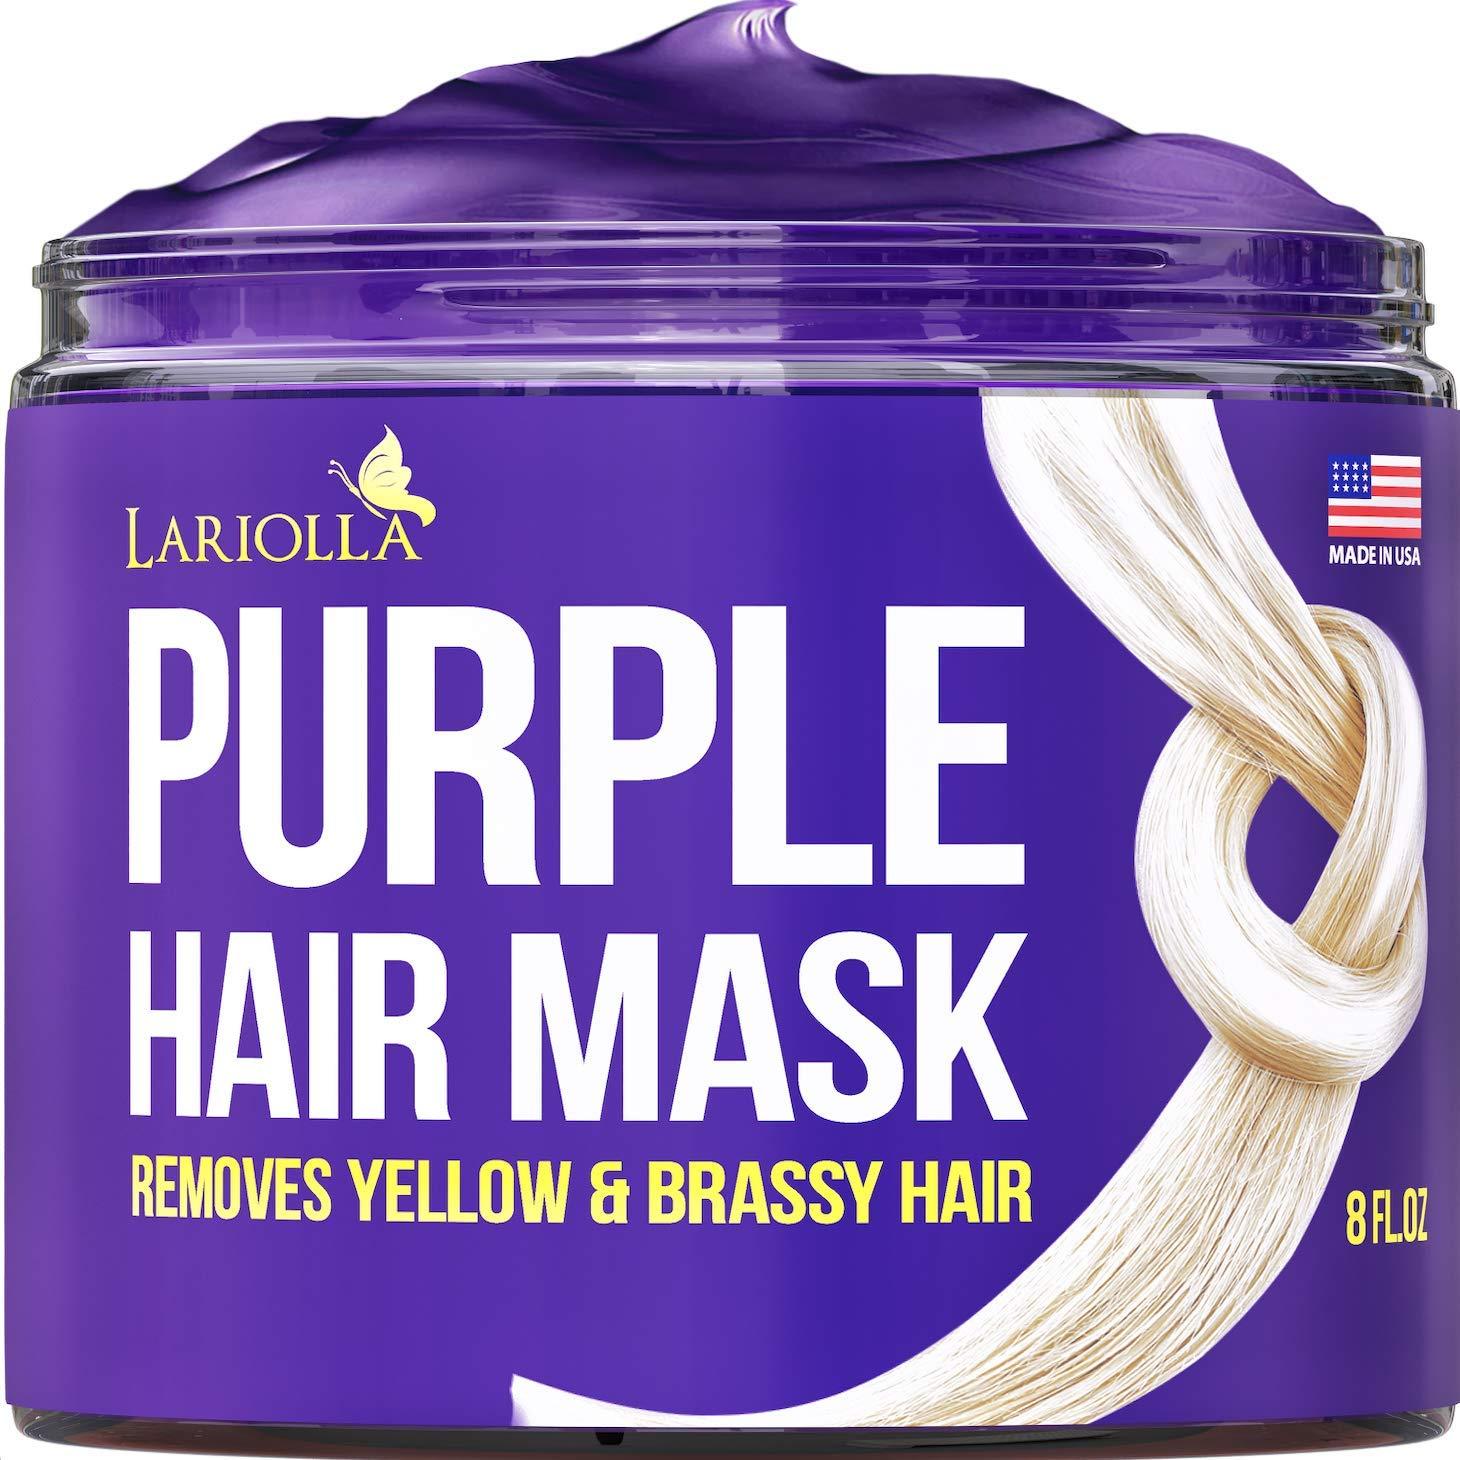 Purple Hair Mask for Blonde with Finally resale start - Jojoba Platinum Oil Raleigh Mall Keratin